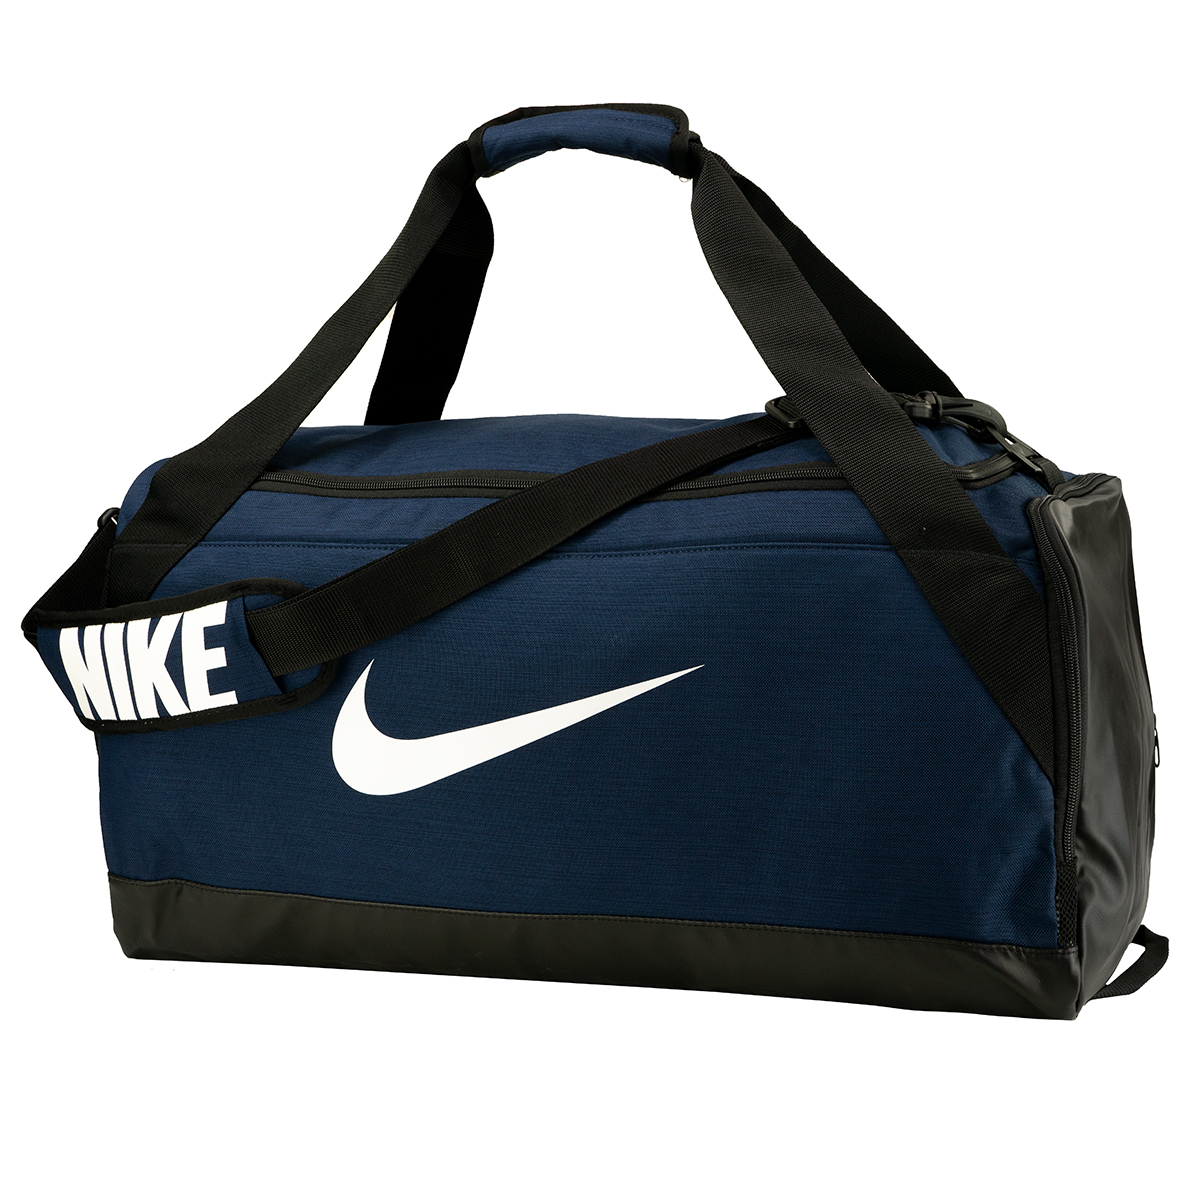 Details about Nike Brasilia Medium Duffel Bag Navy Black White c2aa8b07d7c46